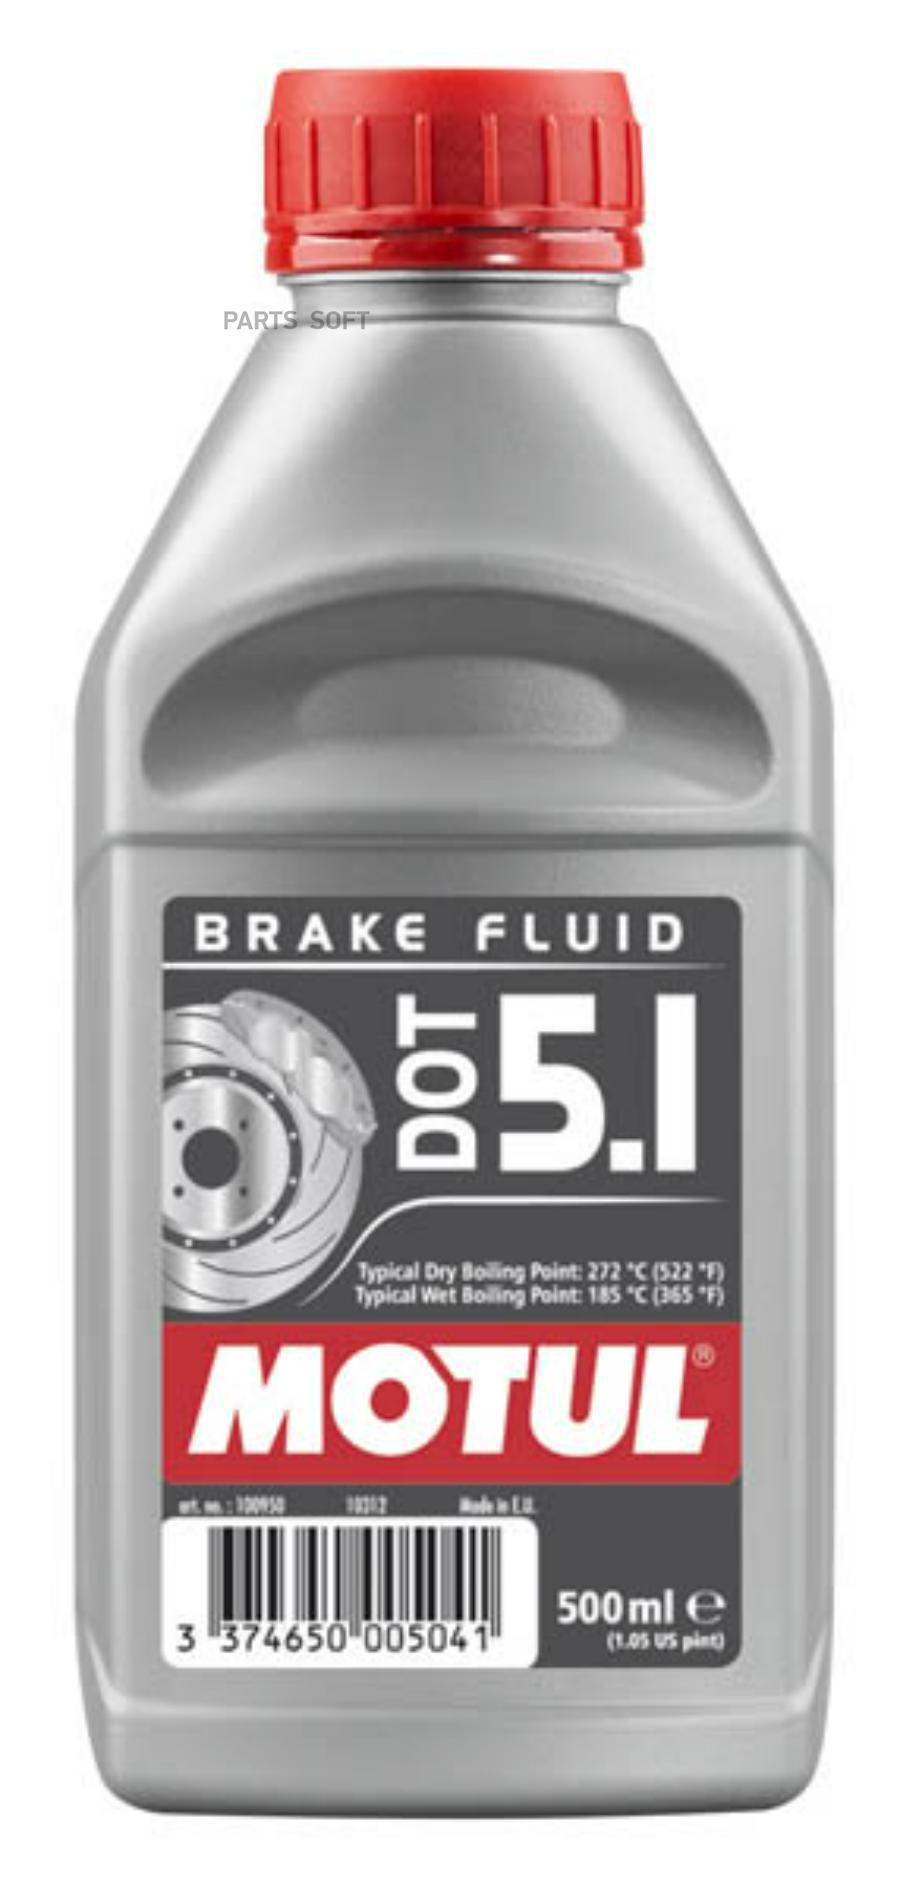 MOTUL DOT- 5.1 Brake Fluid (100%синт) 0,5л тормозная жидкость (12)